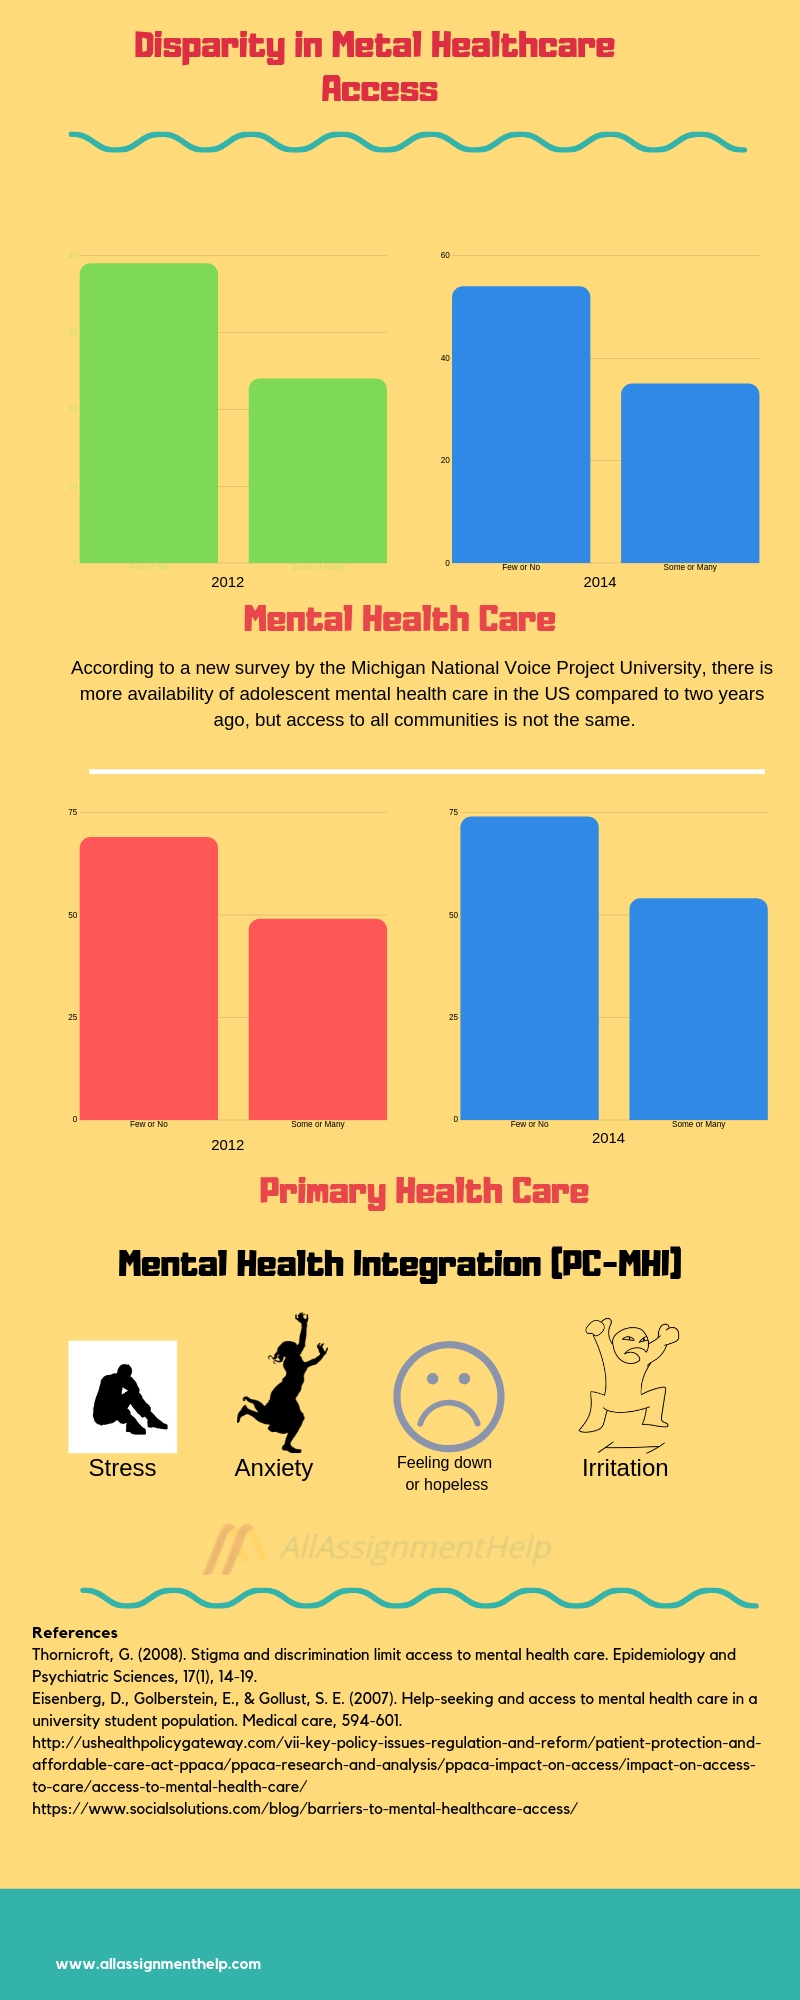 3. Disparity in Mental Healthcare Access